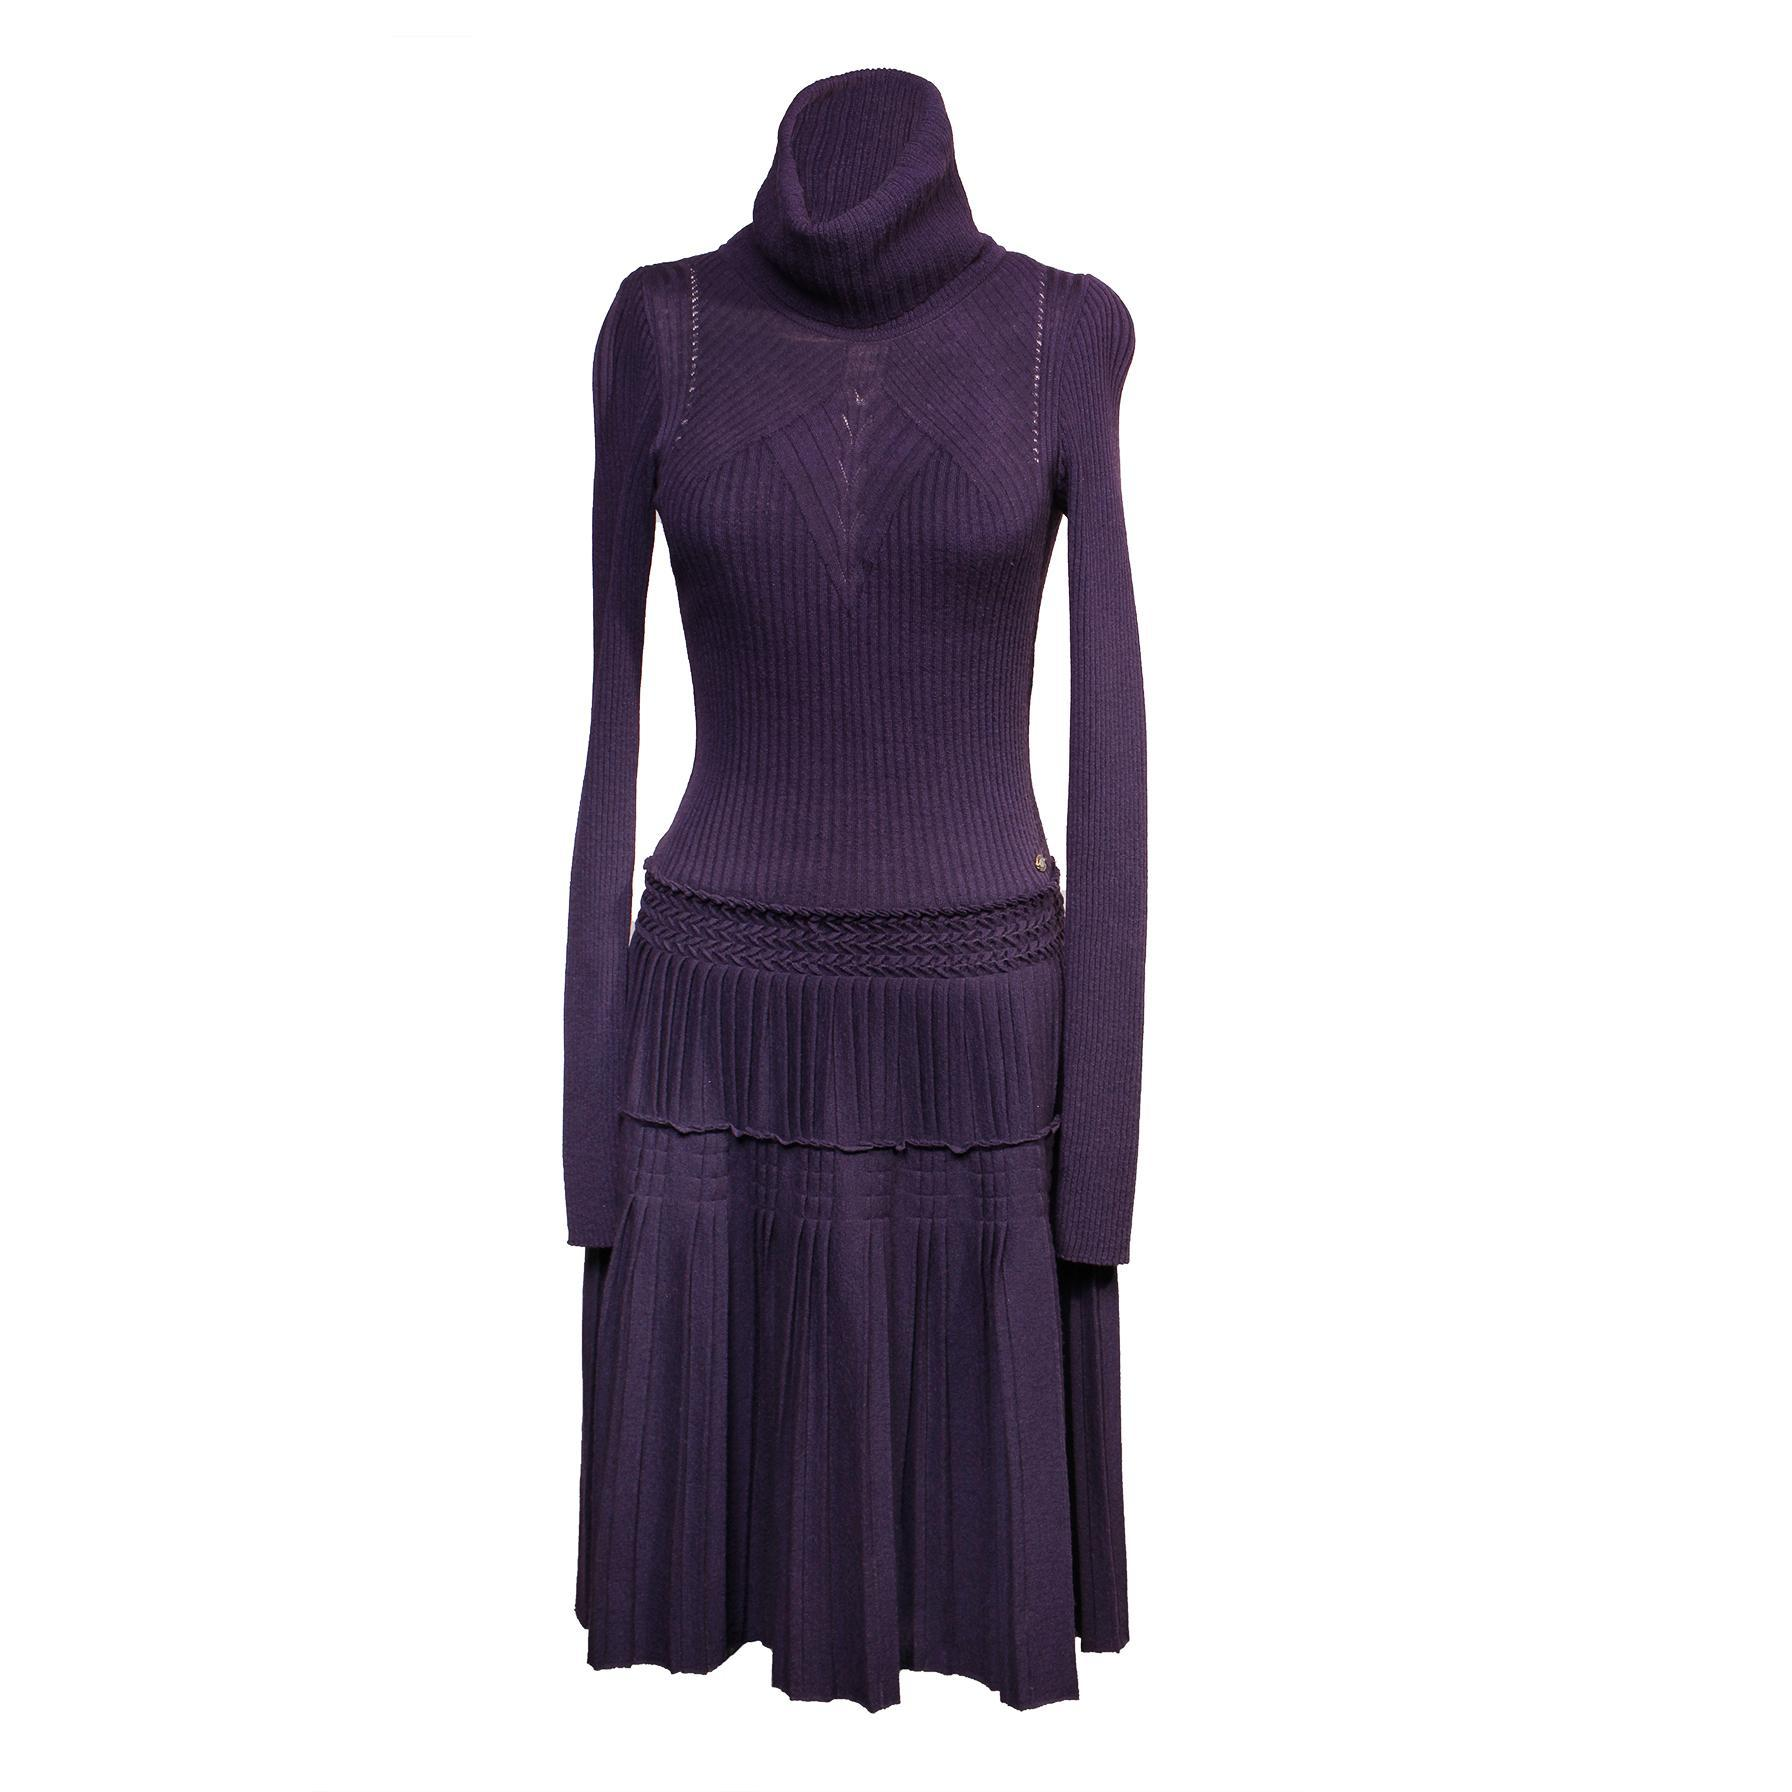 Chanel Size 38 Knit Turtleneck Dress